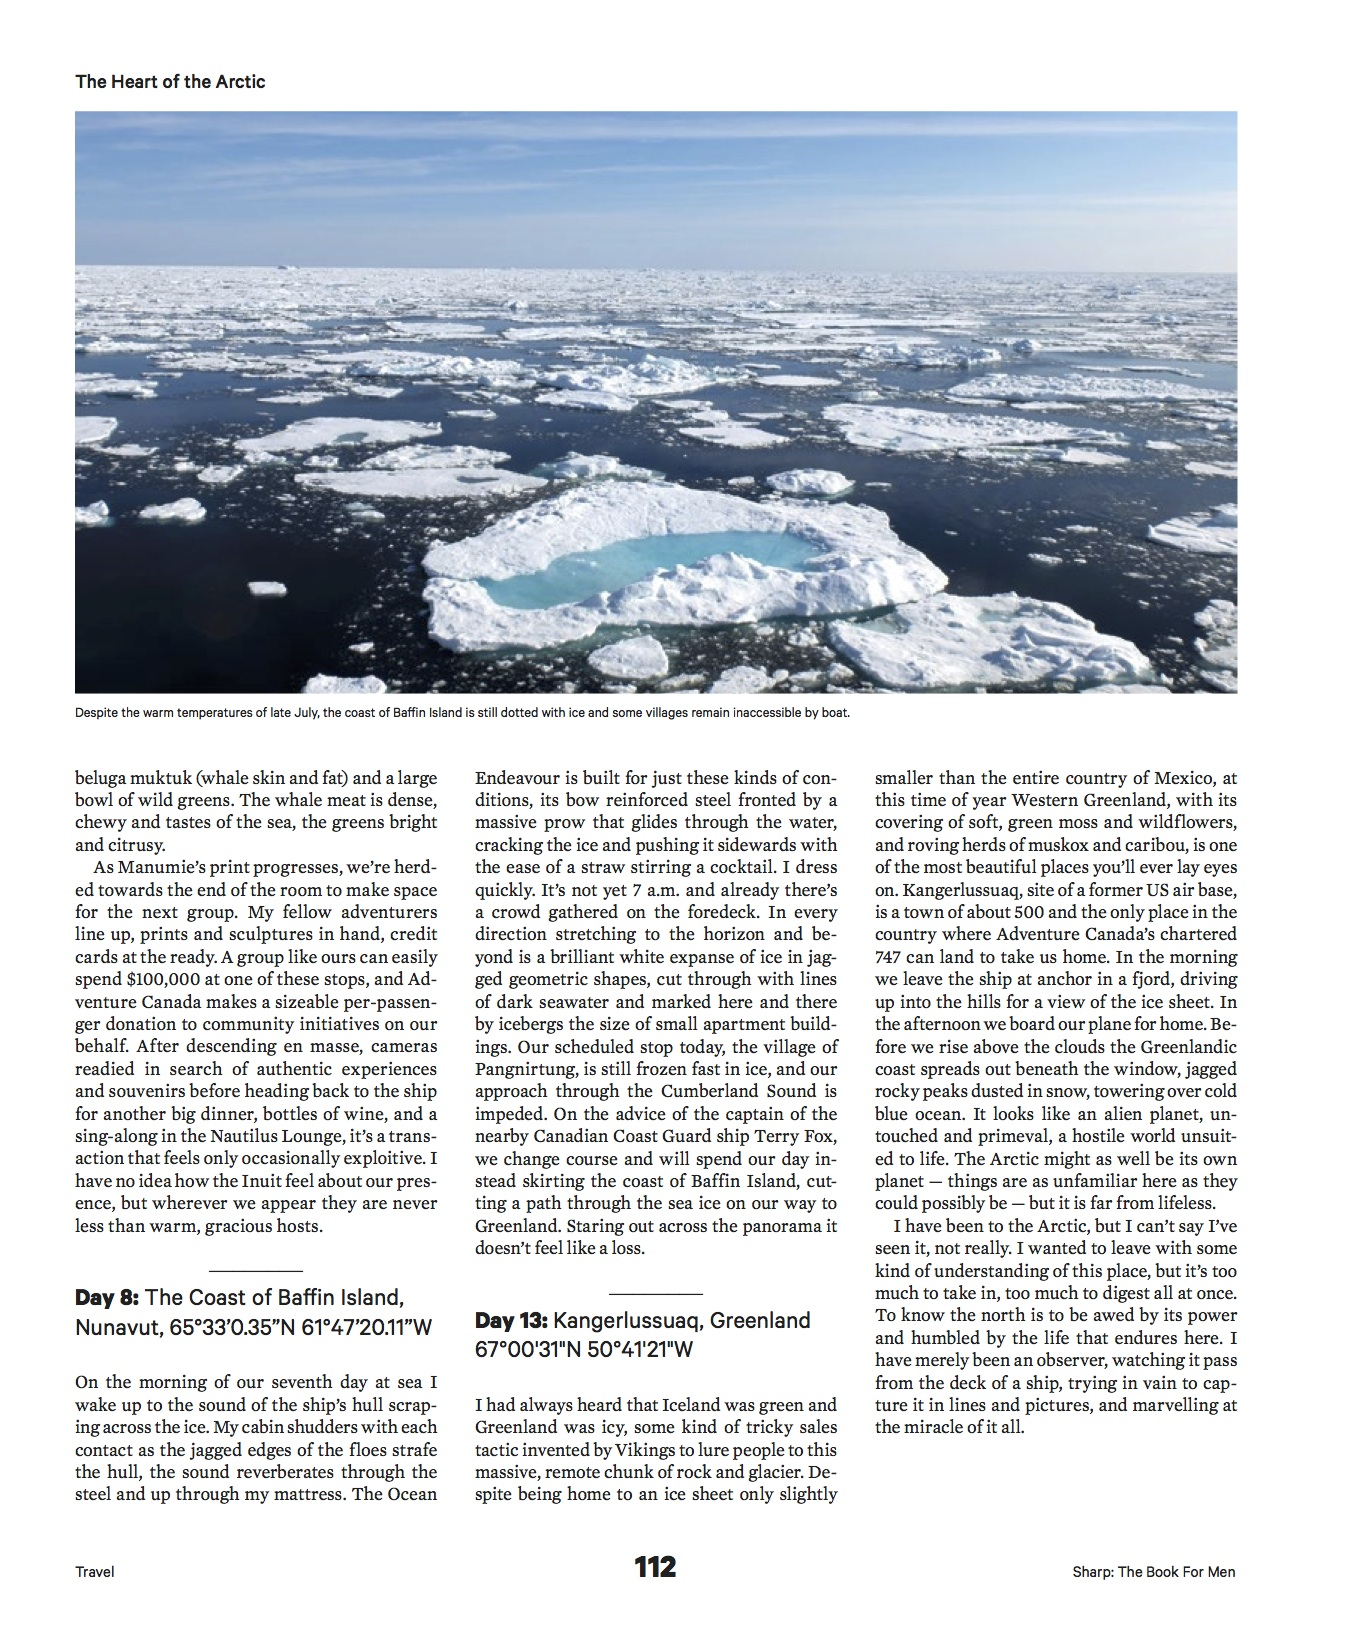 Heart of the Arctic4.jpg